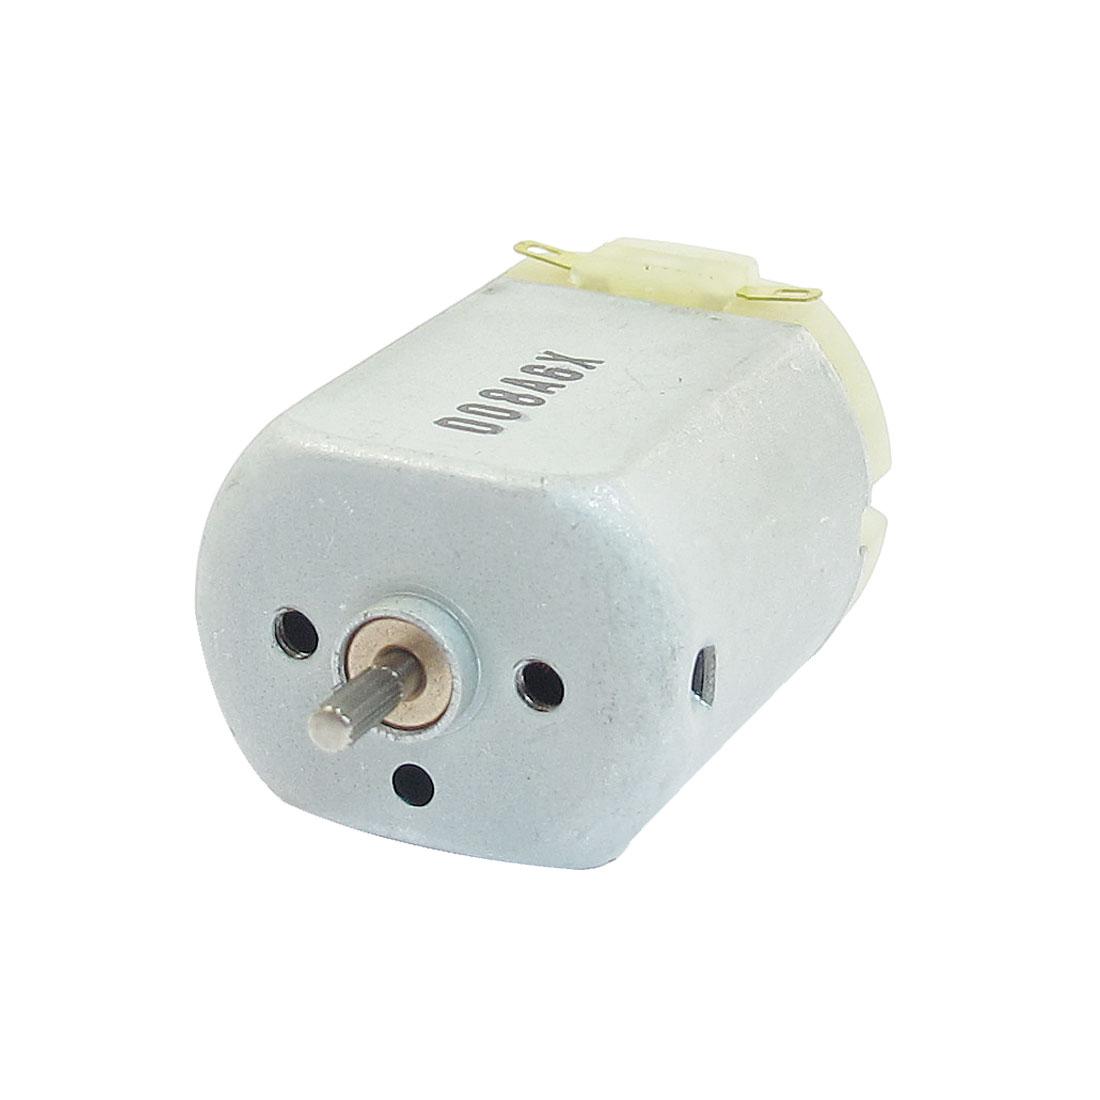 5200-21000RPM-3-12V-High-Torque-Magnetic-Electric-Mini-DC-Motor